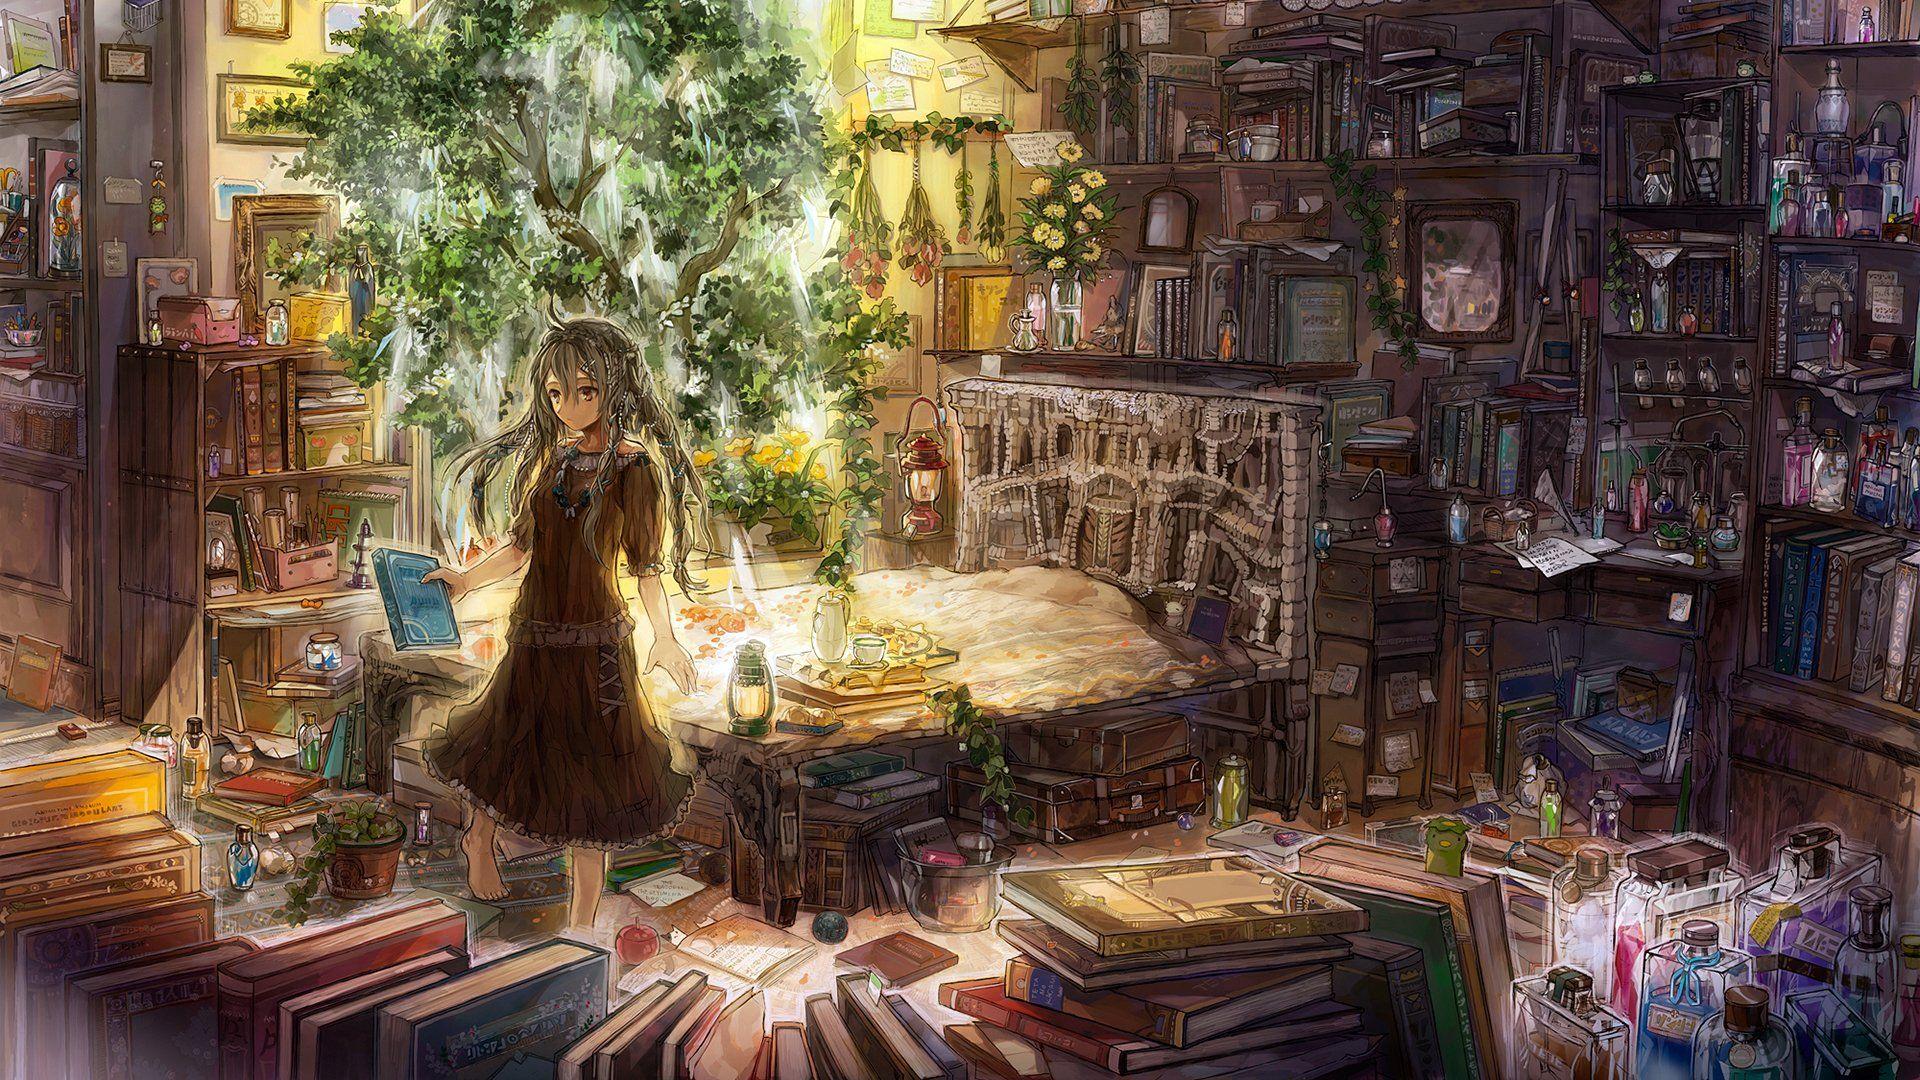 Anime Original Long Hair Bottle Herbs Book Tree Original